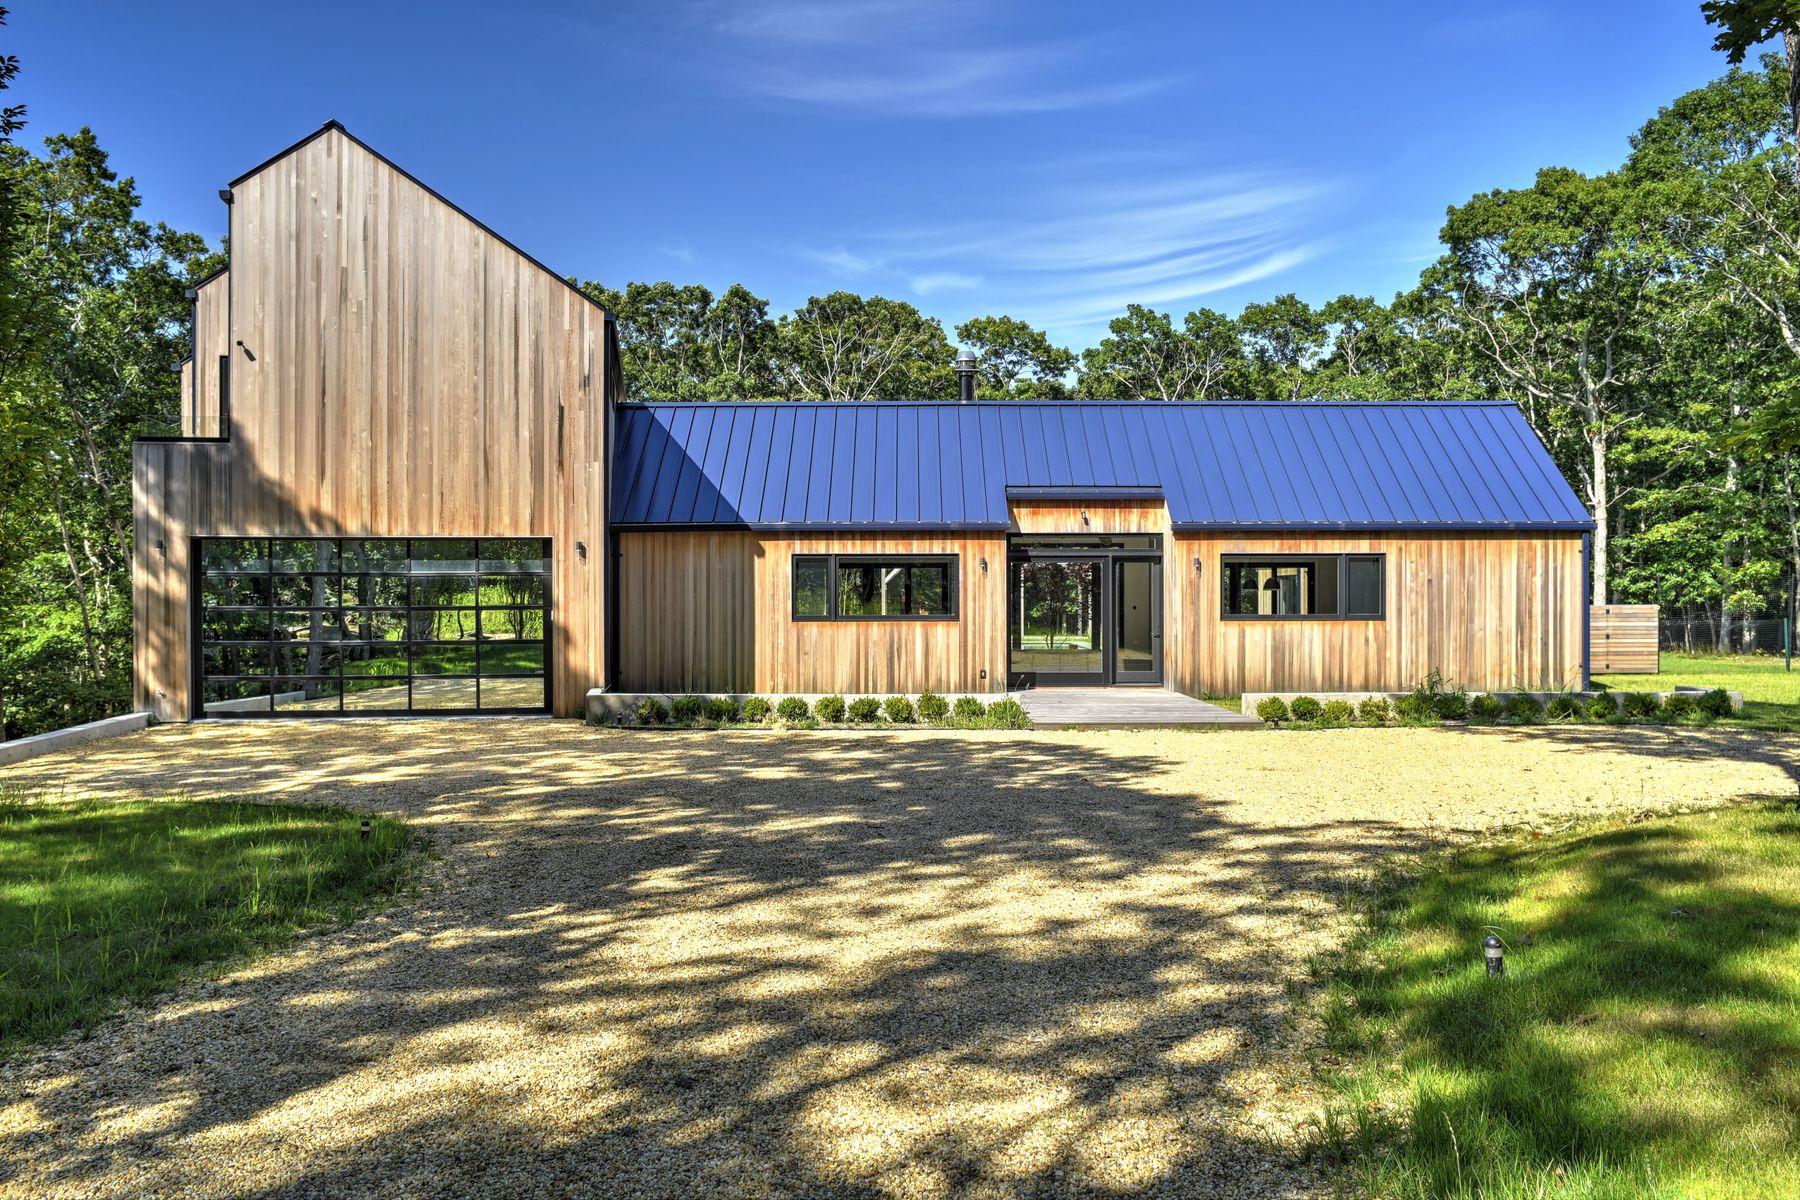 Single Family Home for Active at Atelier 22 By Studio Zung 22 Pepperidge Lane Amagansett, New York 11930 United States